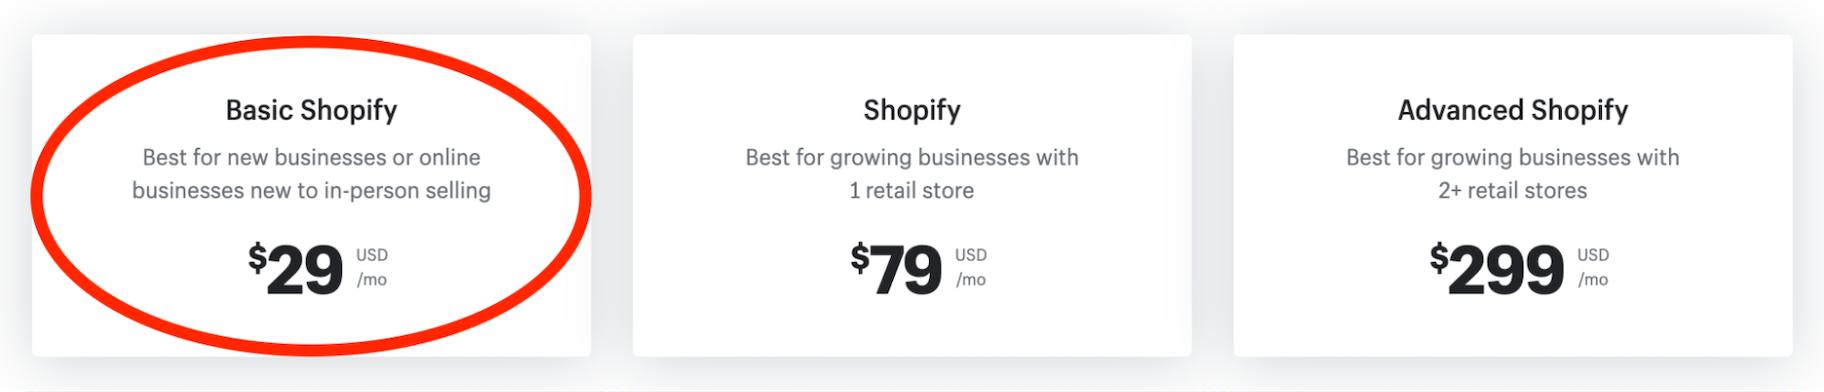 Basic Shopify Pricing